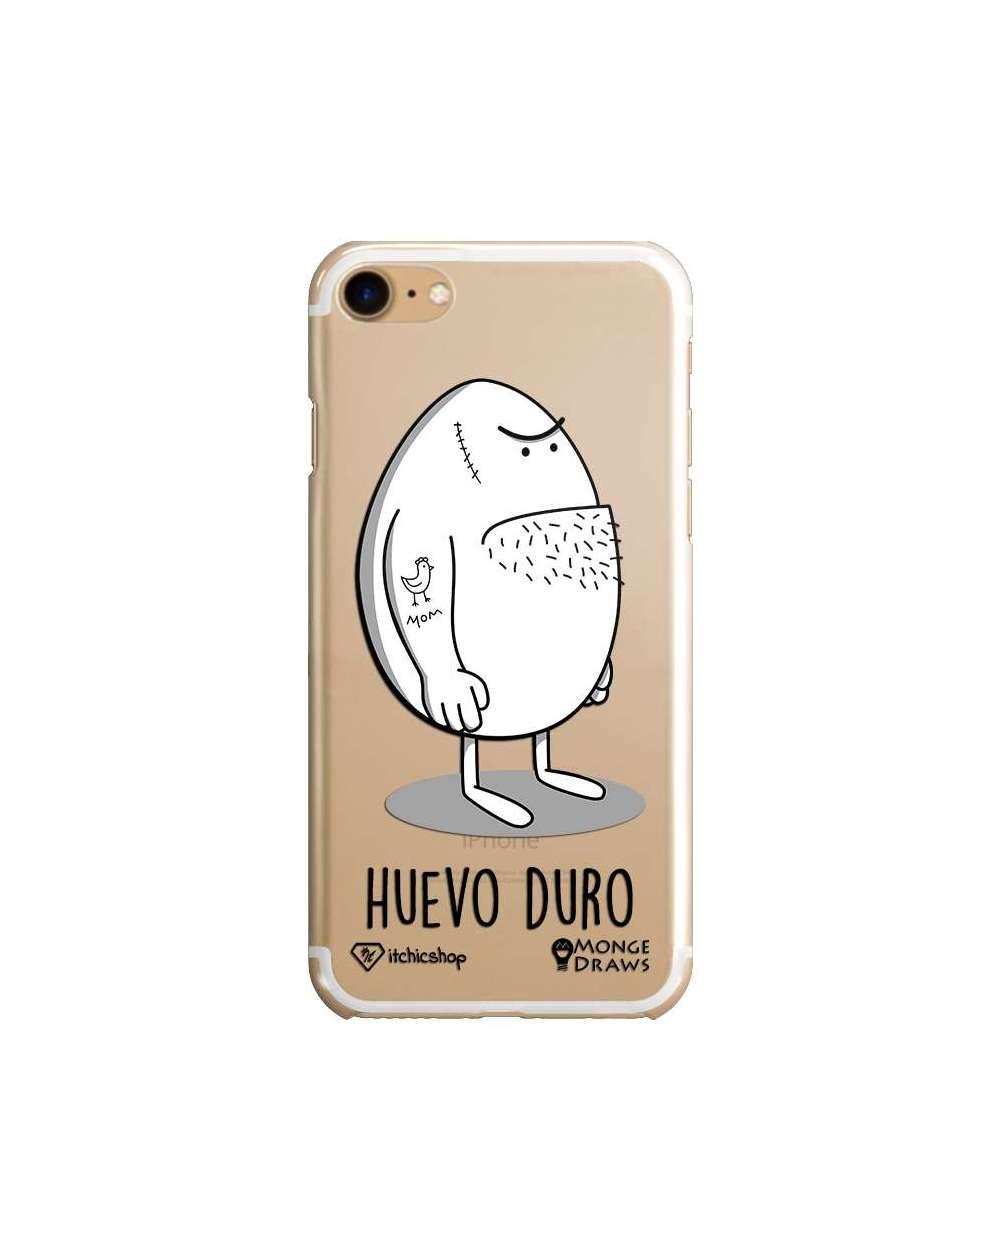 Huevo duro